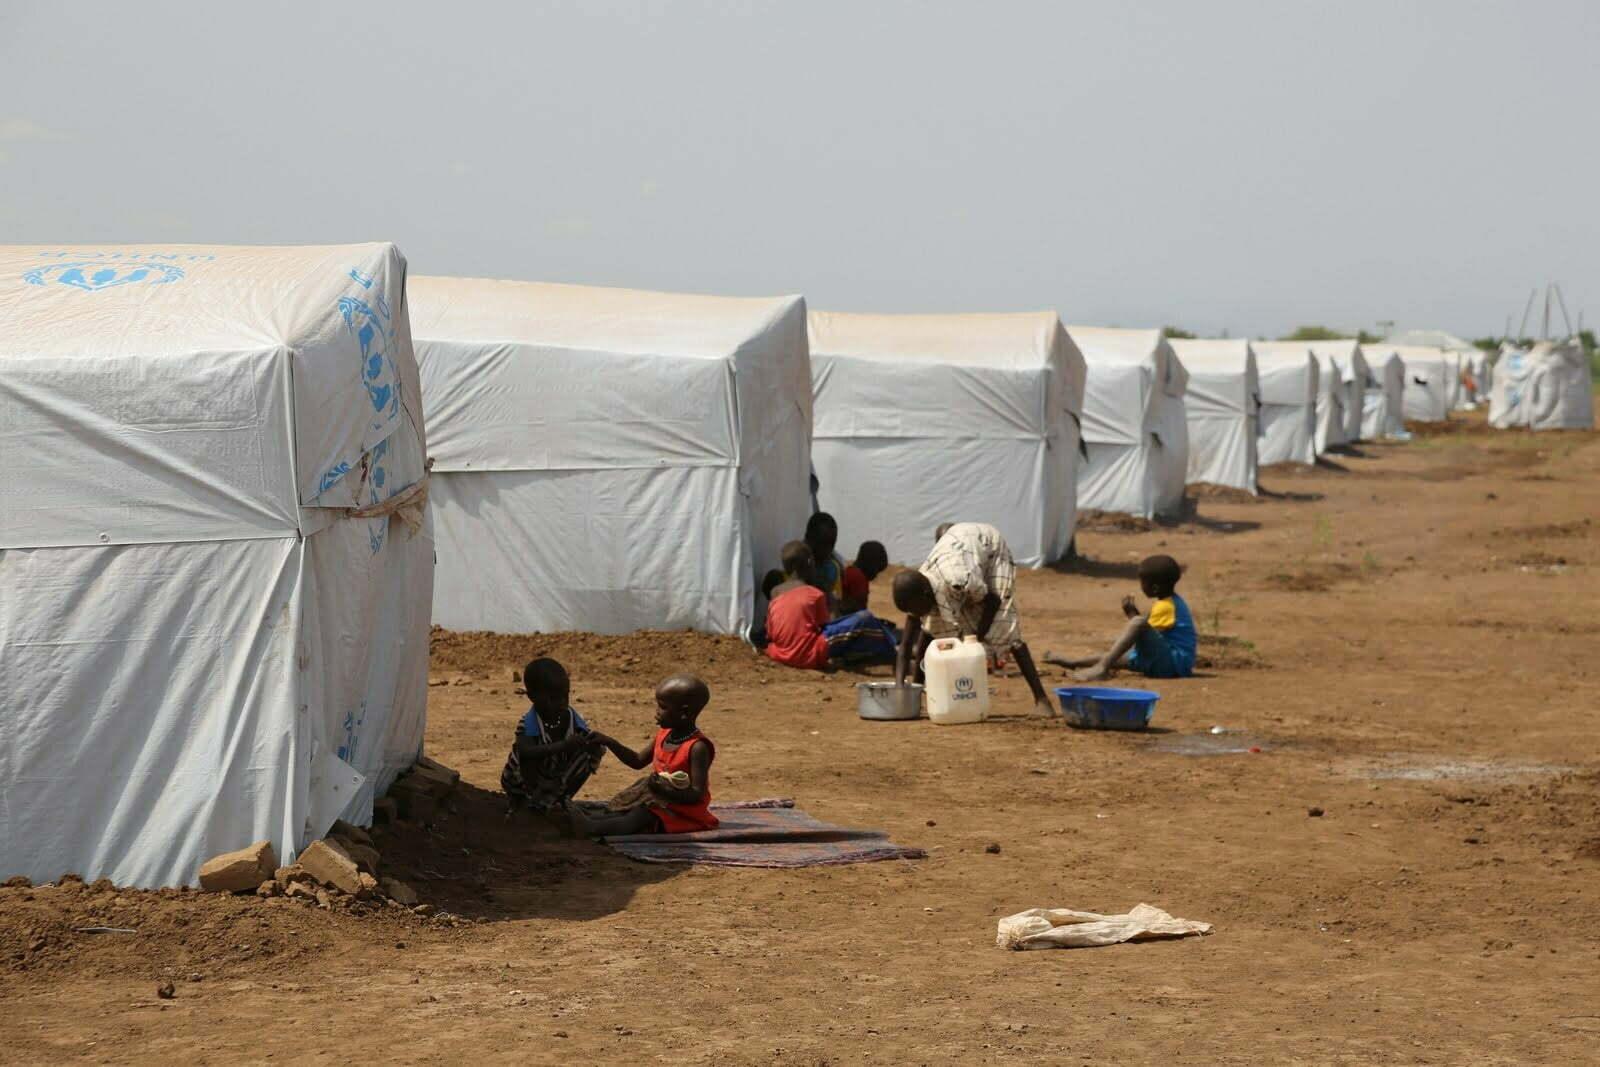 Refugee children facing malnutrition in Kakuma as ration cuts announced